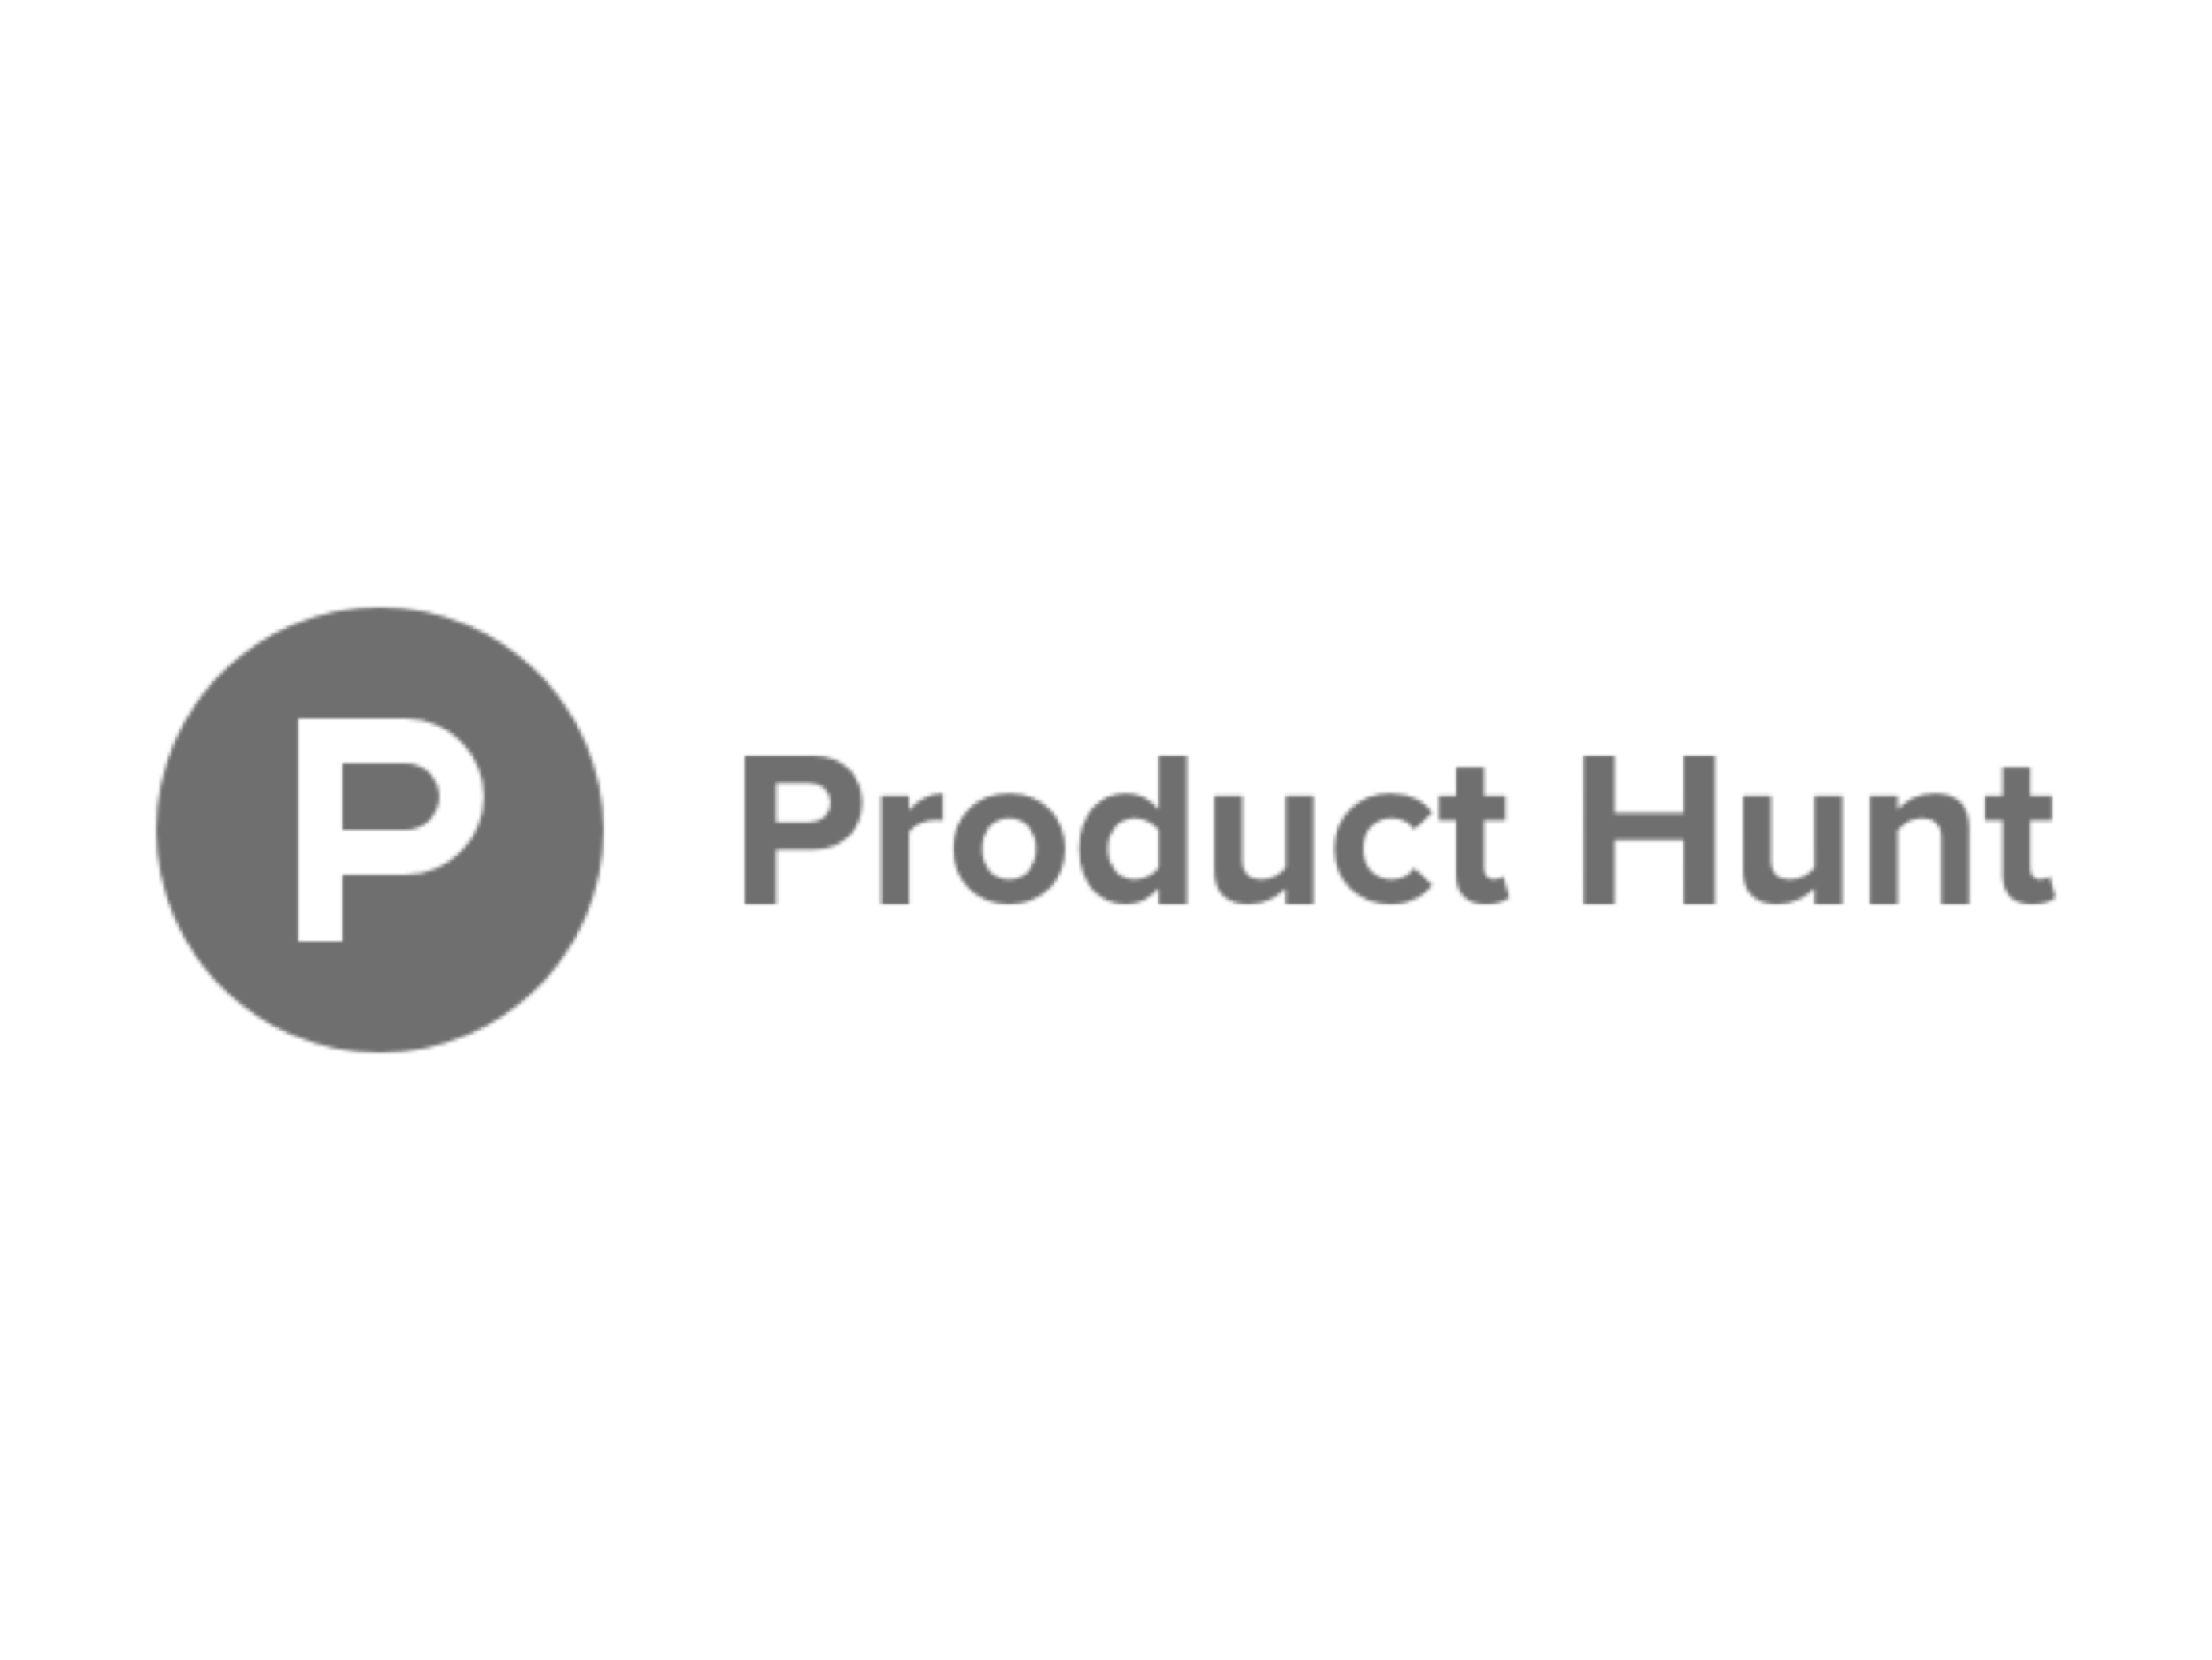 product_hunt_logo.png